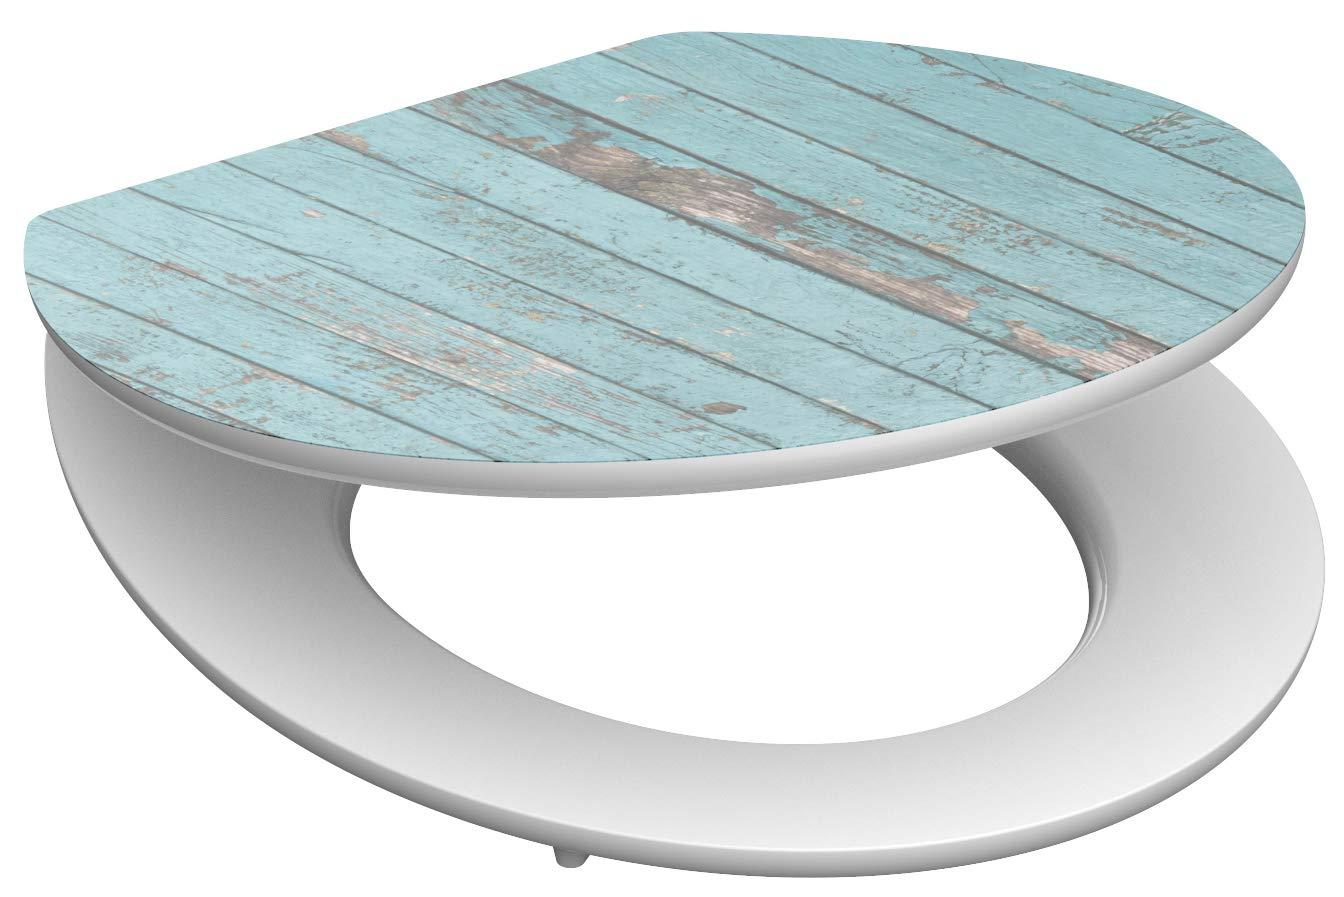 Eisl / Schuette Wc sedátko Blue Wood MDF HG se zpomalovacím mechanismem SOFT-CLOSE 80536BlueWood